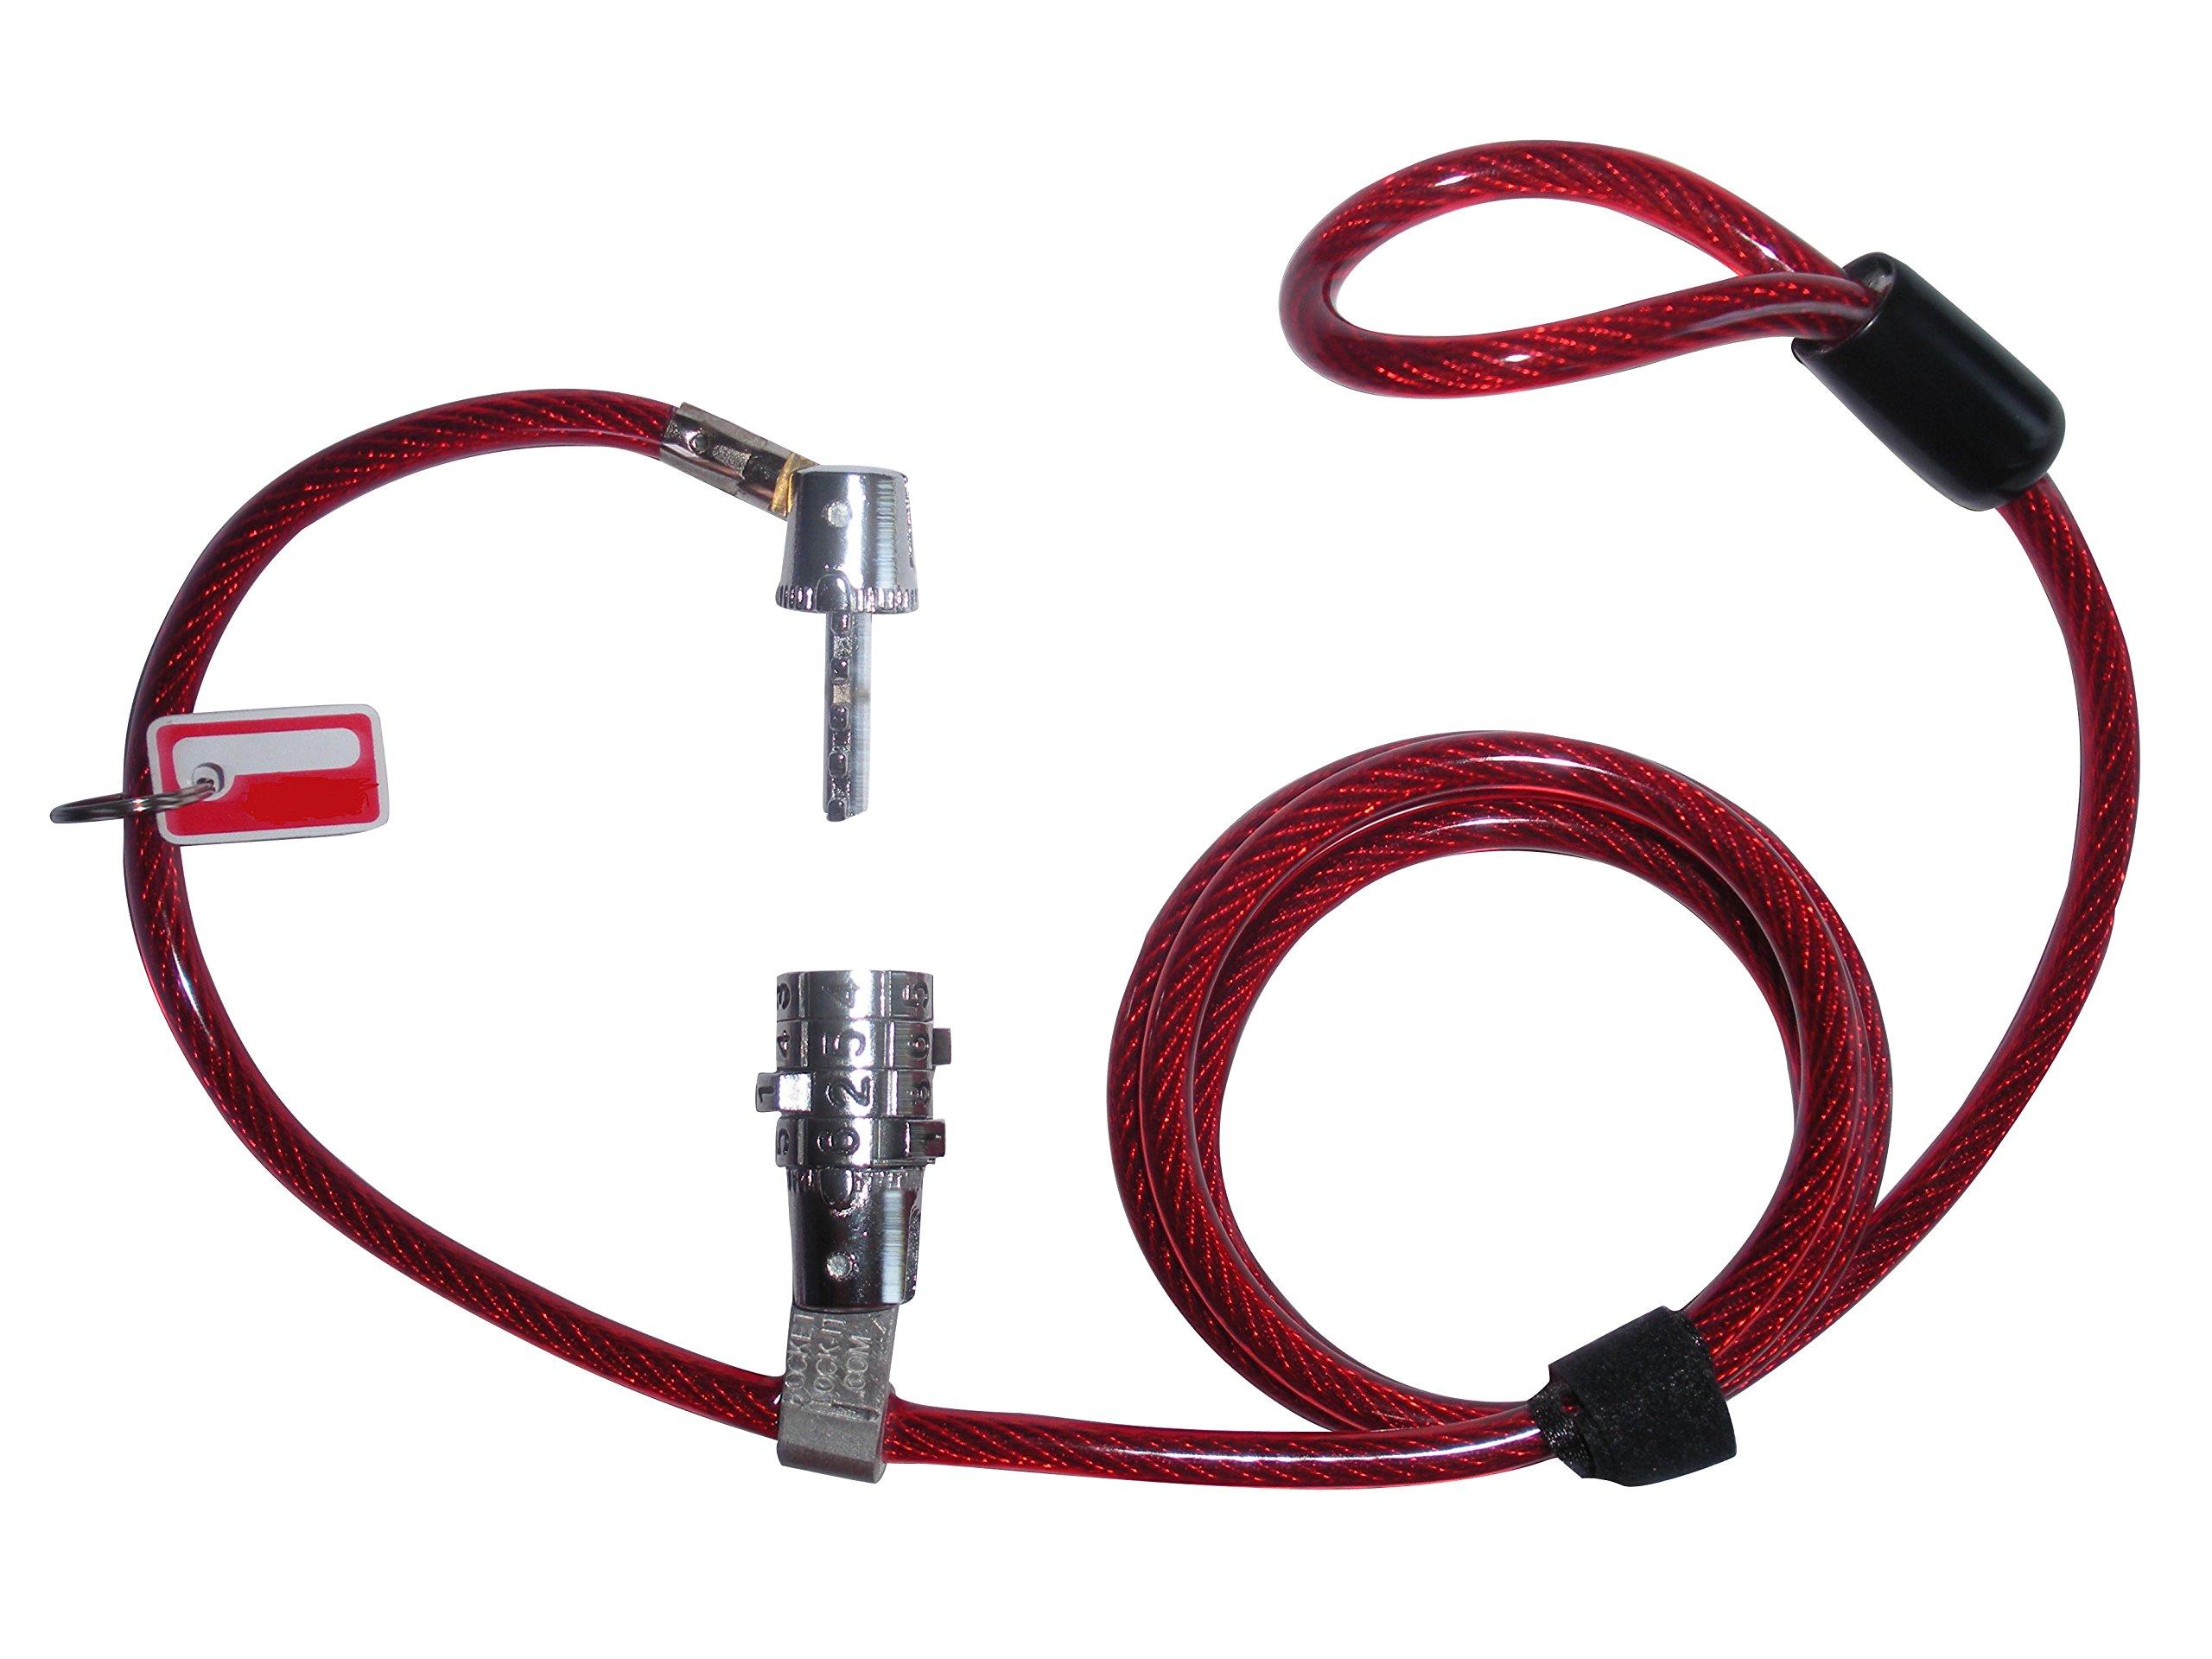 ValetMyStick Skateboard Snowboard Razor RipStik Scooter Combination Cable Lock (Red - preset Combo)